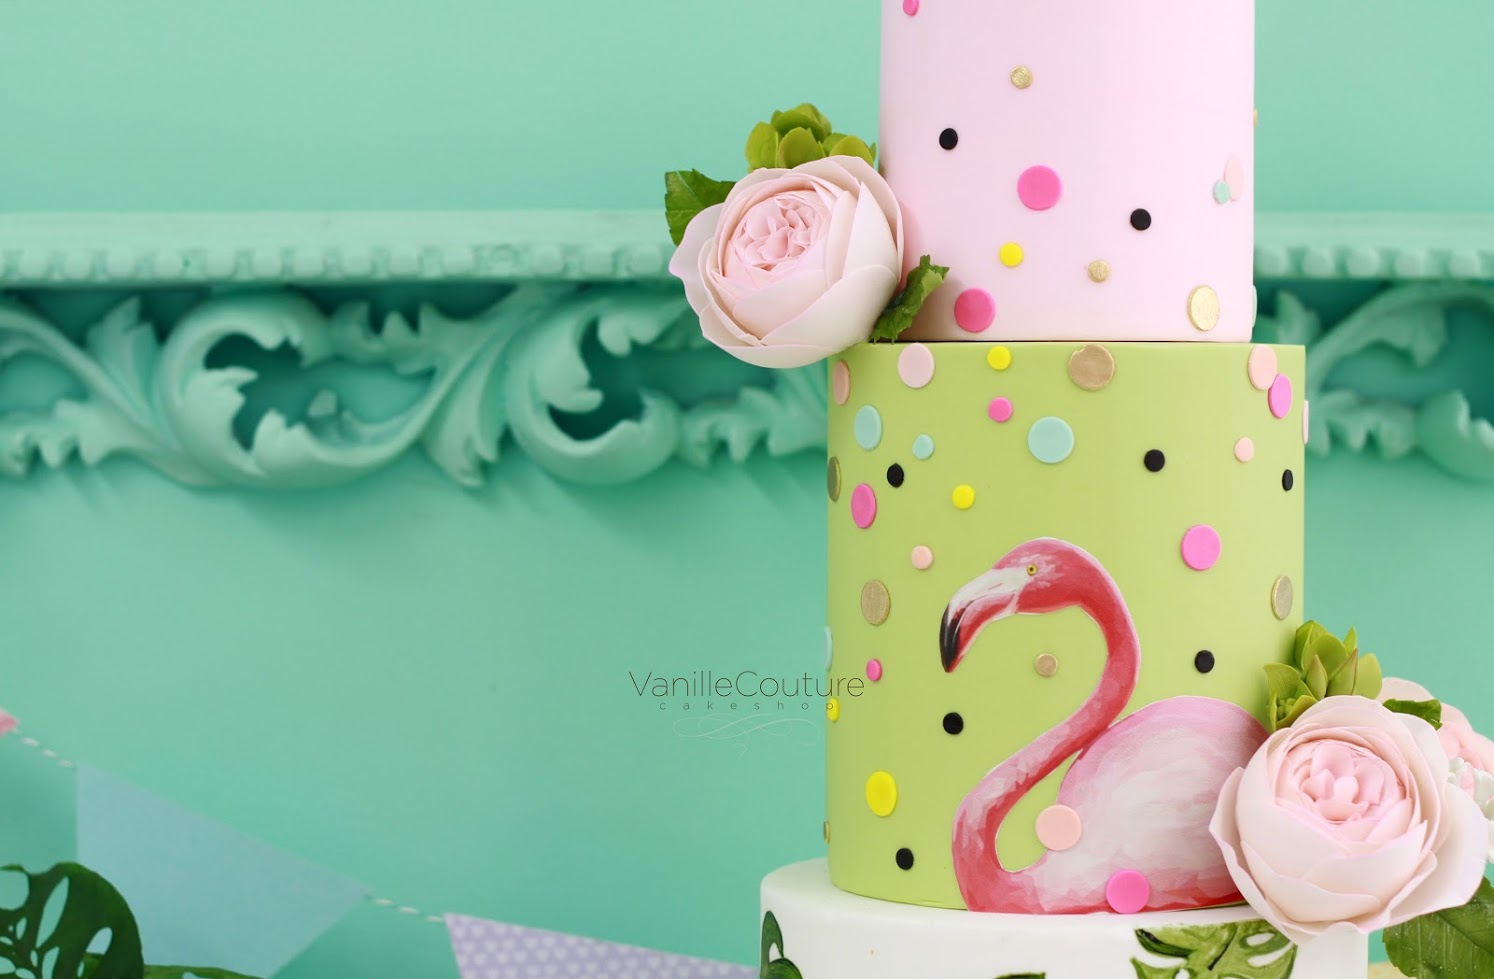 Willie Soto Lili Cuellar Vanille Couture Cakeshop Flamingo 13